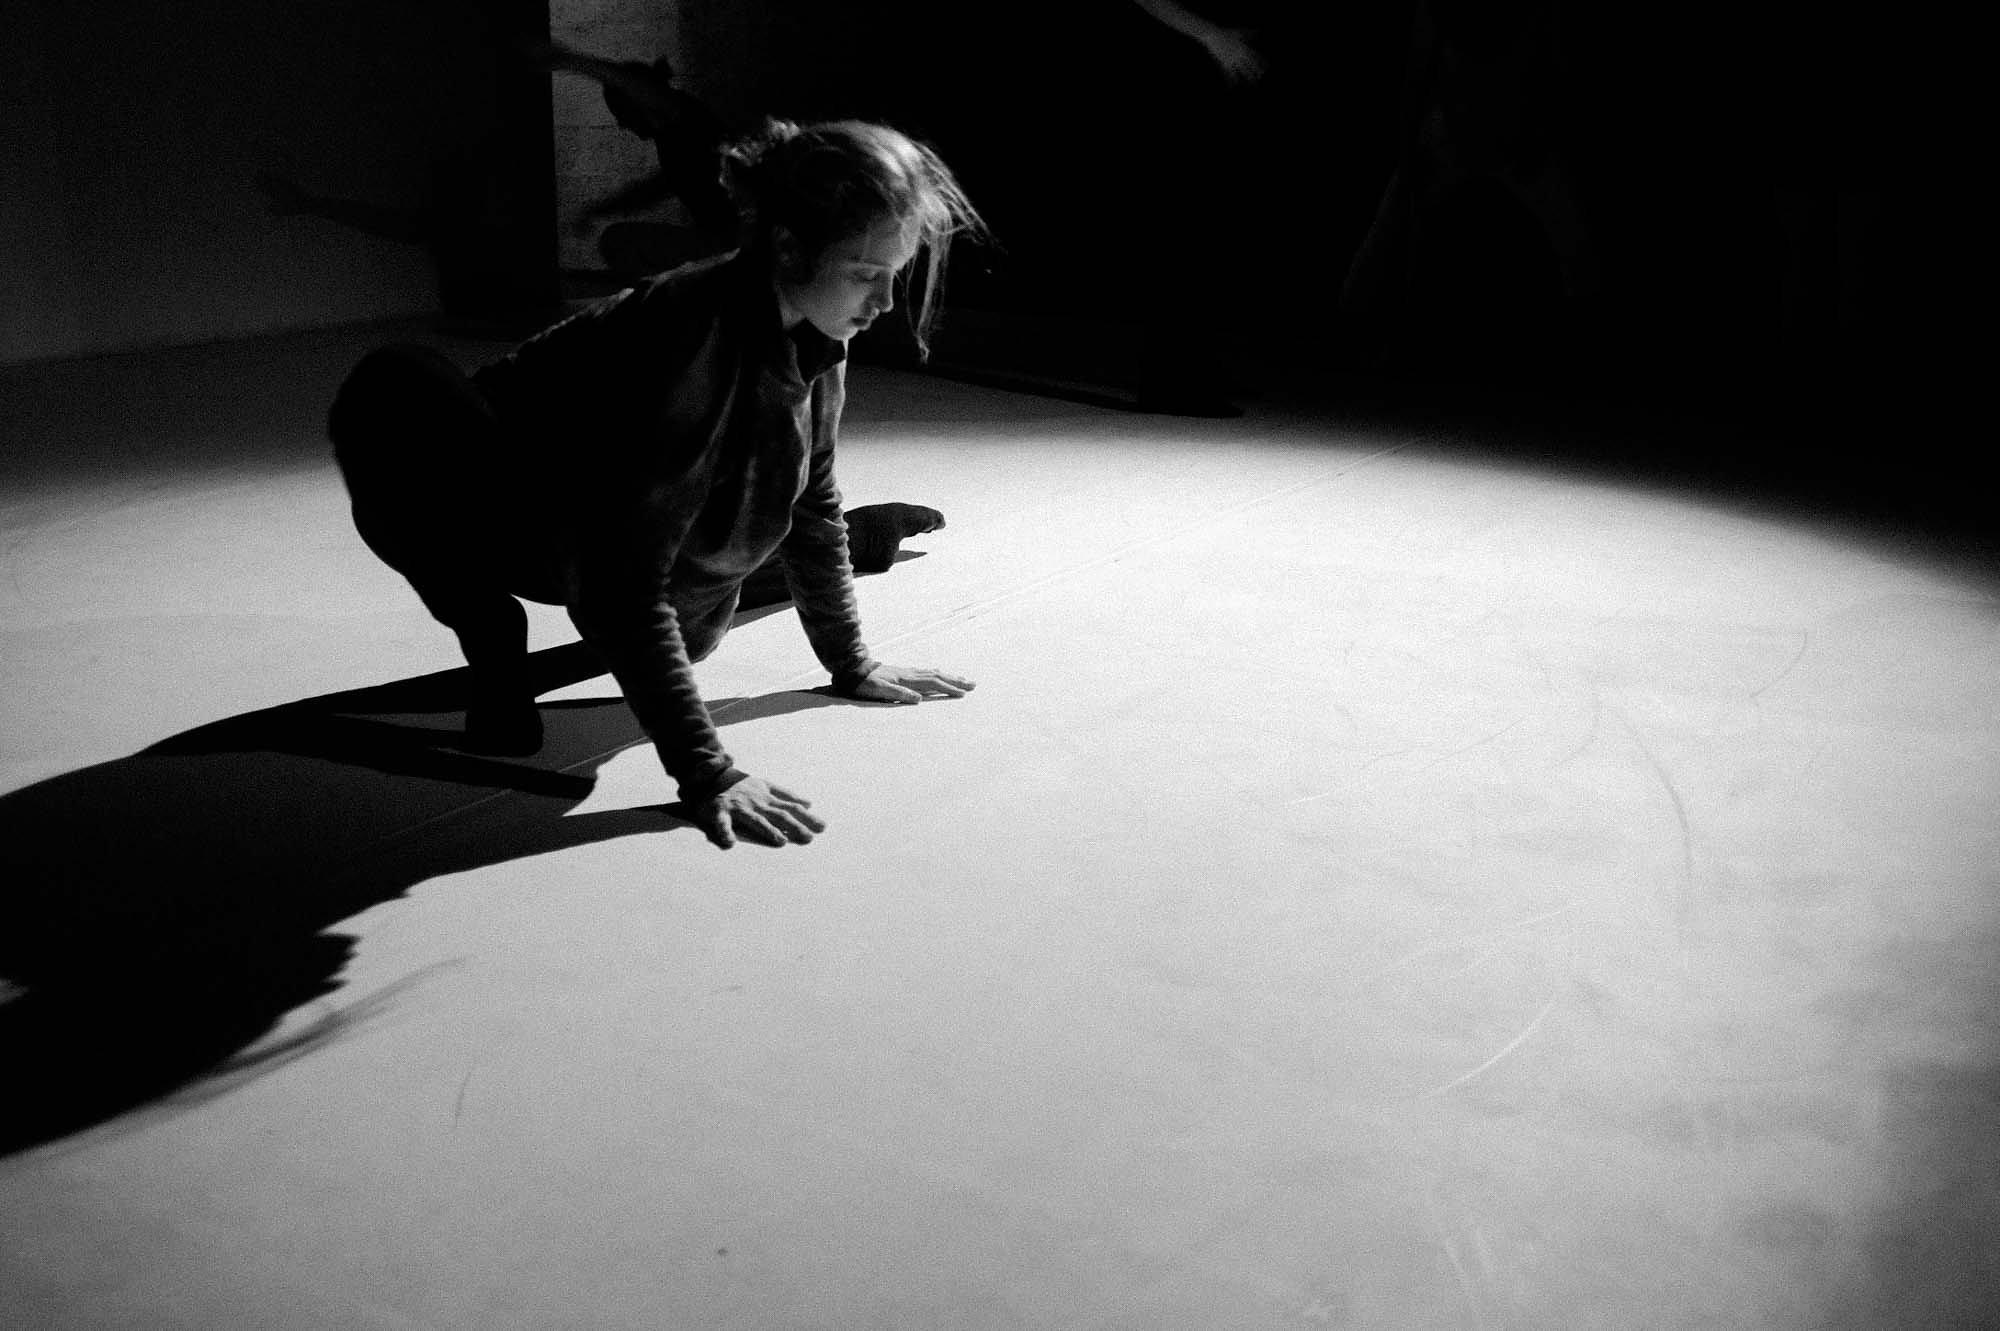 Claudia Germuga warms up, pre-show  Volume VI, Issue I, March 2016   Image: Corey Melton